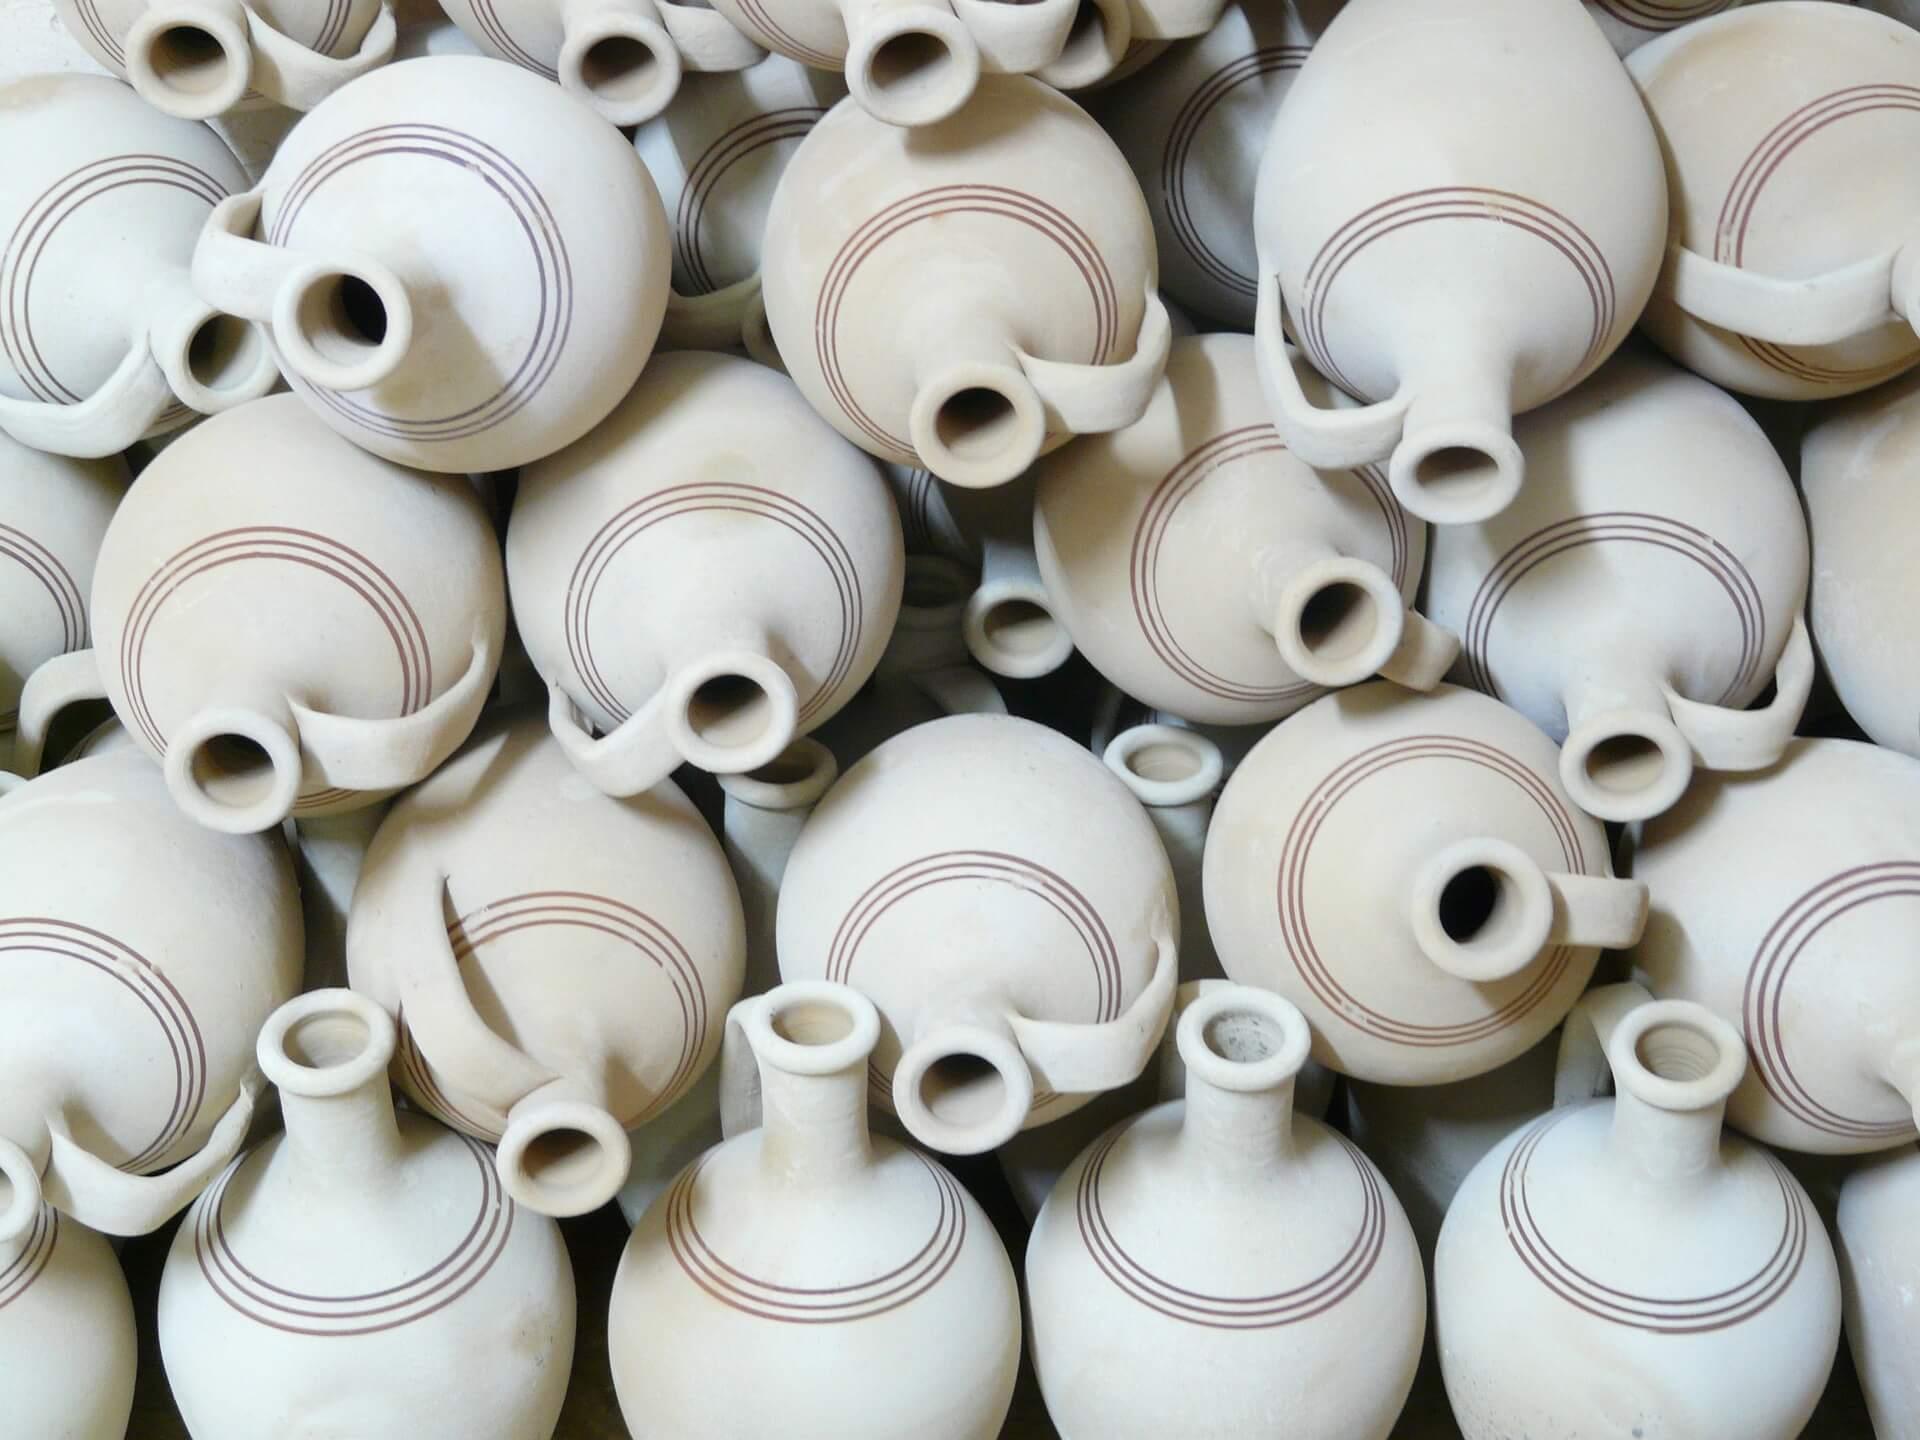 generic porcelain jars